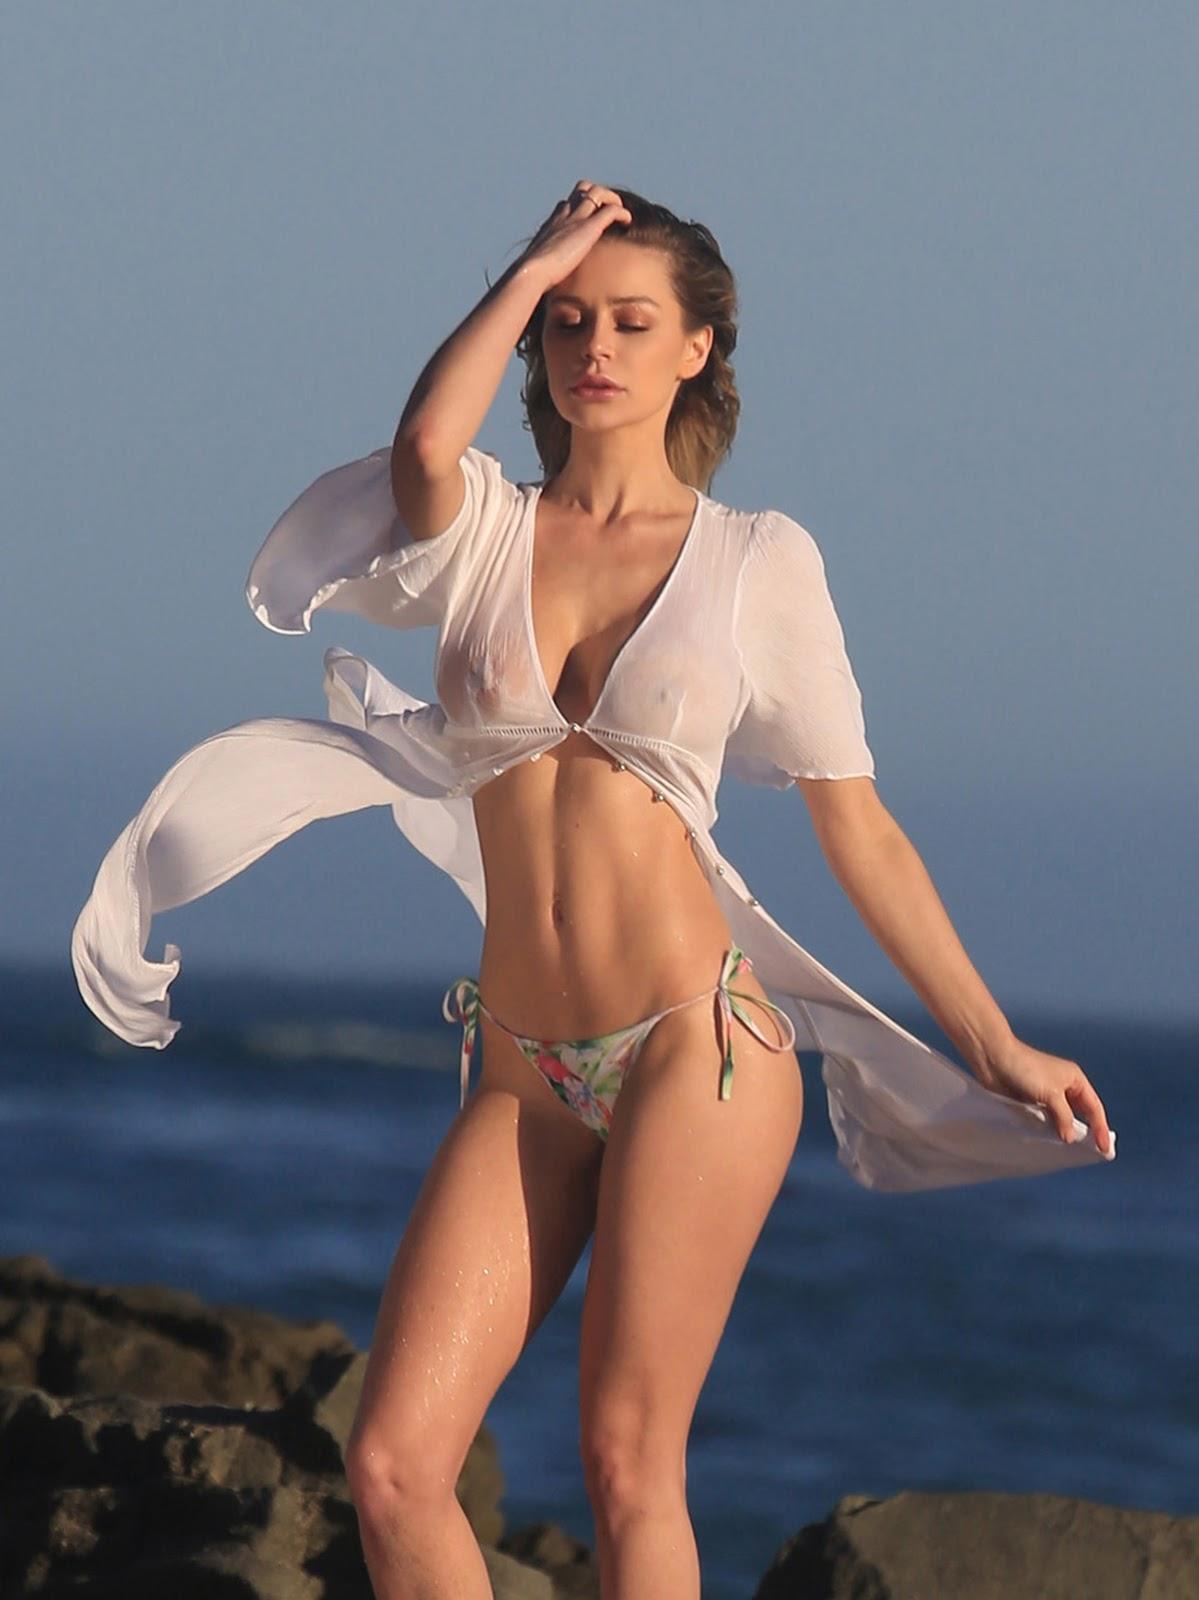 Kate compton nude